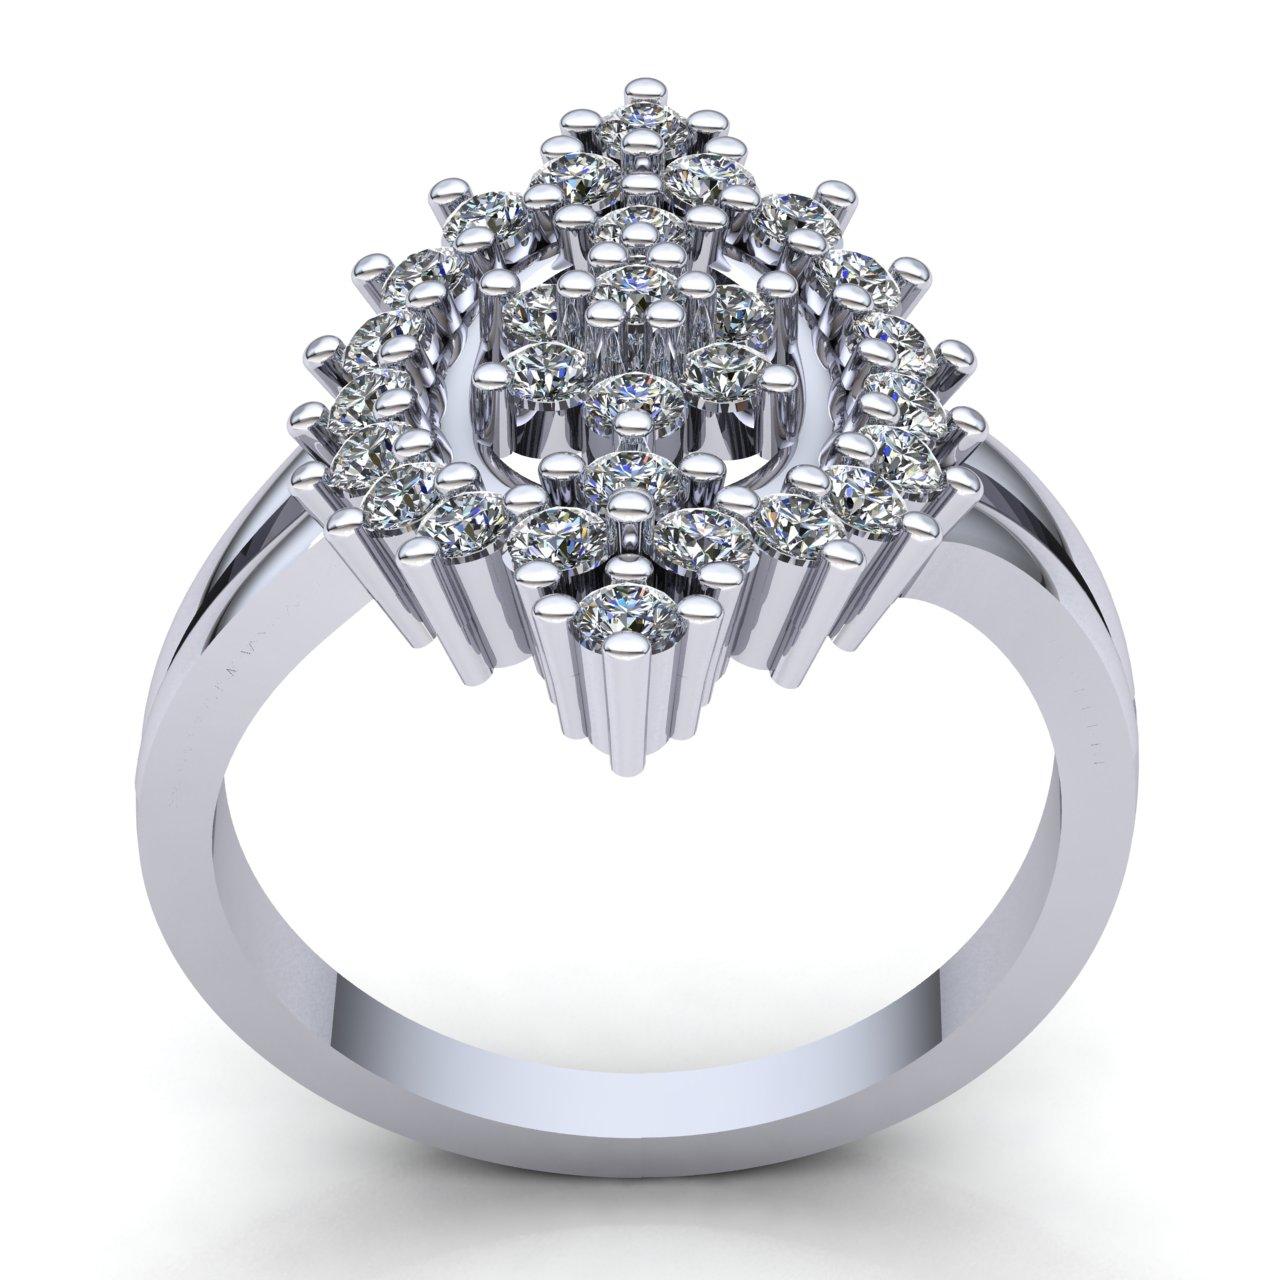 1-Quilate-Diamante-Brillante-Redondo-Mujer-Novia-Flor-Halo-Anillo-de-Compromiso miniatura 11